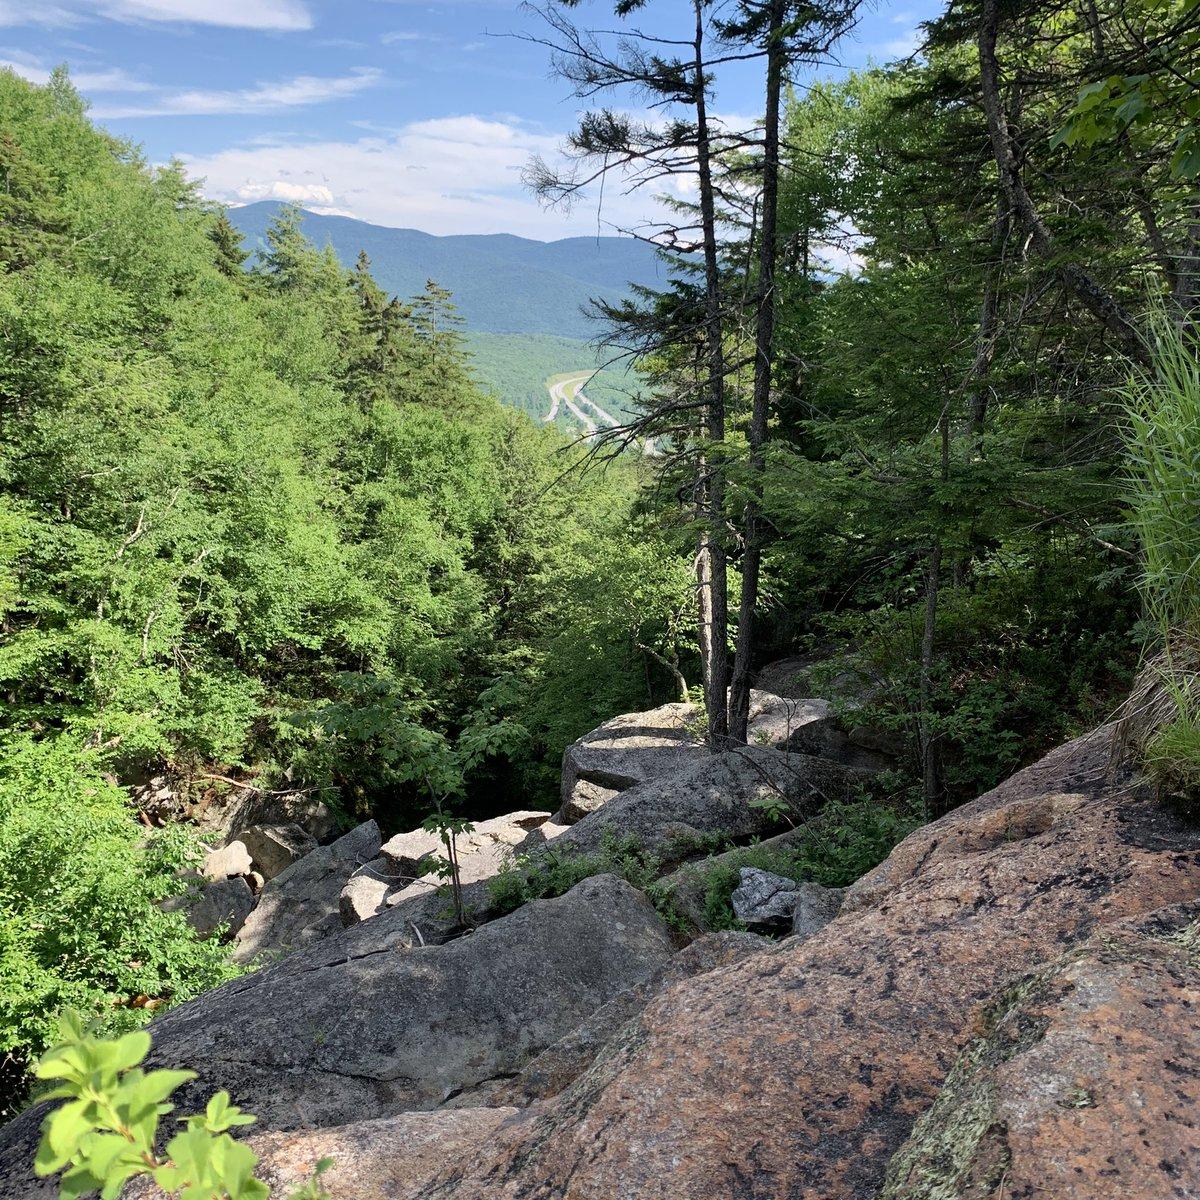 4th of July weekend hike!#hikingadventures #hiking #NewHampshirepic.twitter.com/MmrJRYDhpF – at Georgiana Falls (Lower)